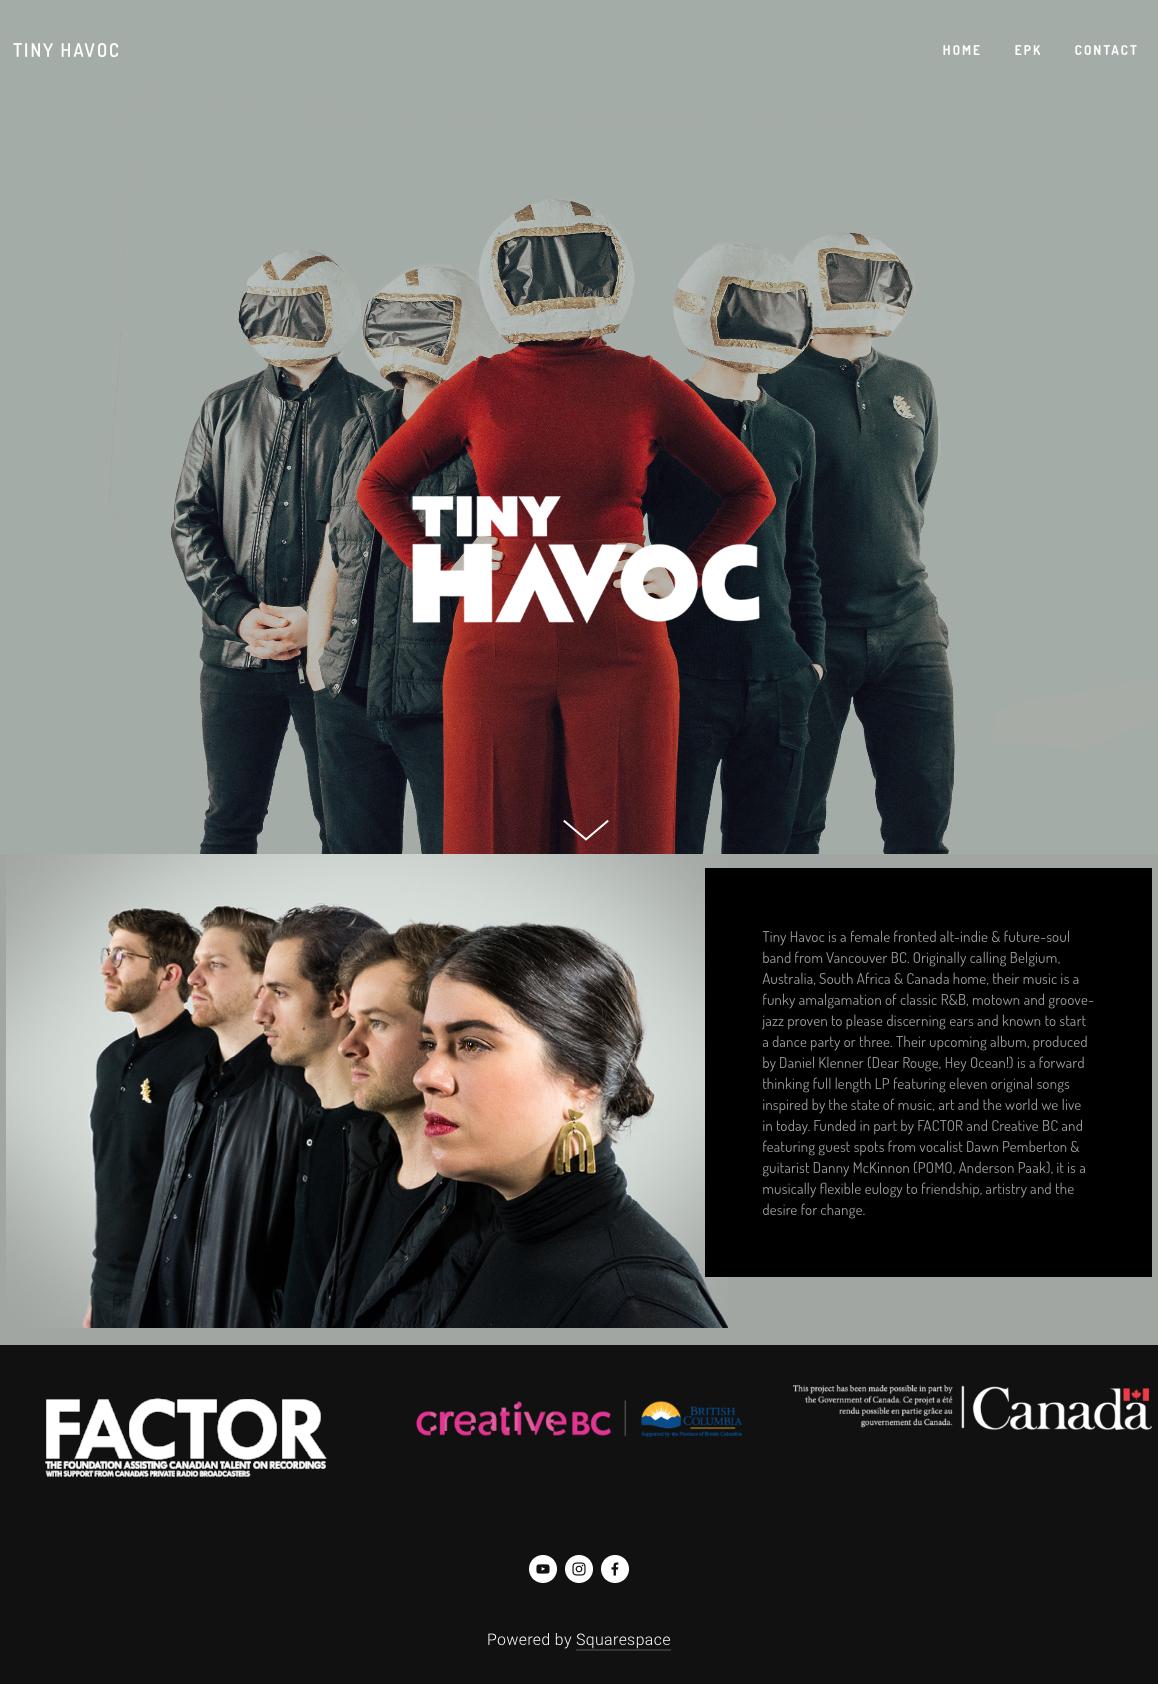 TINY HAVOC